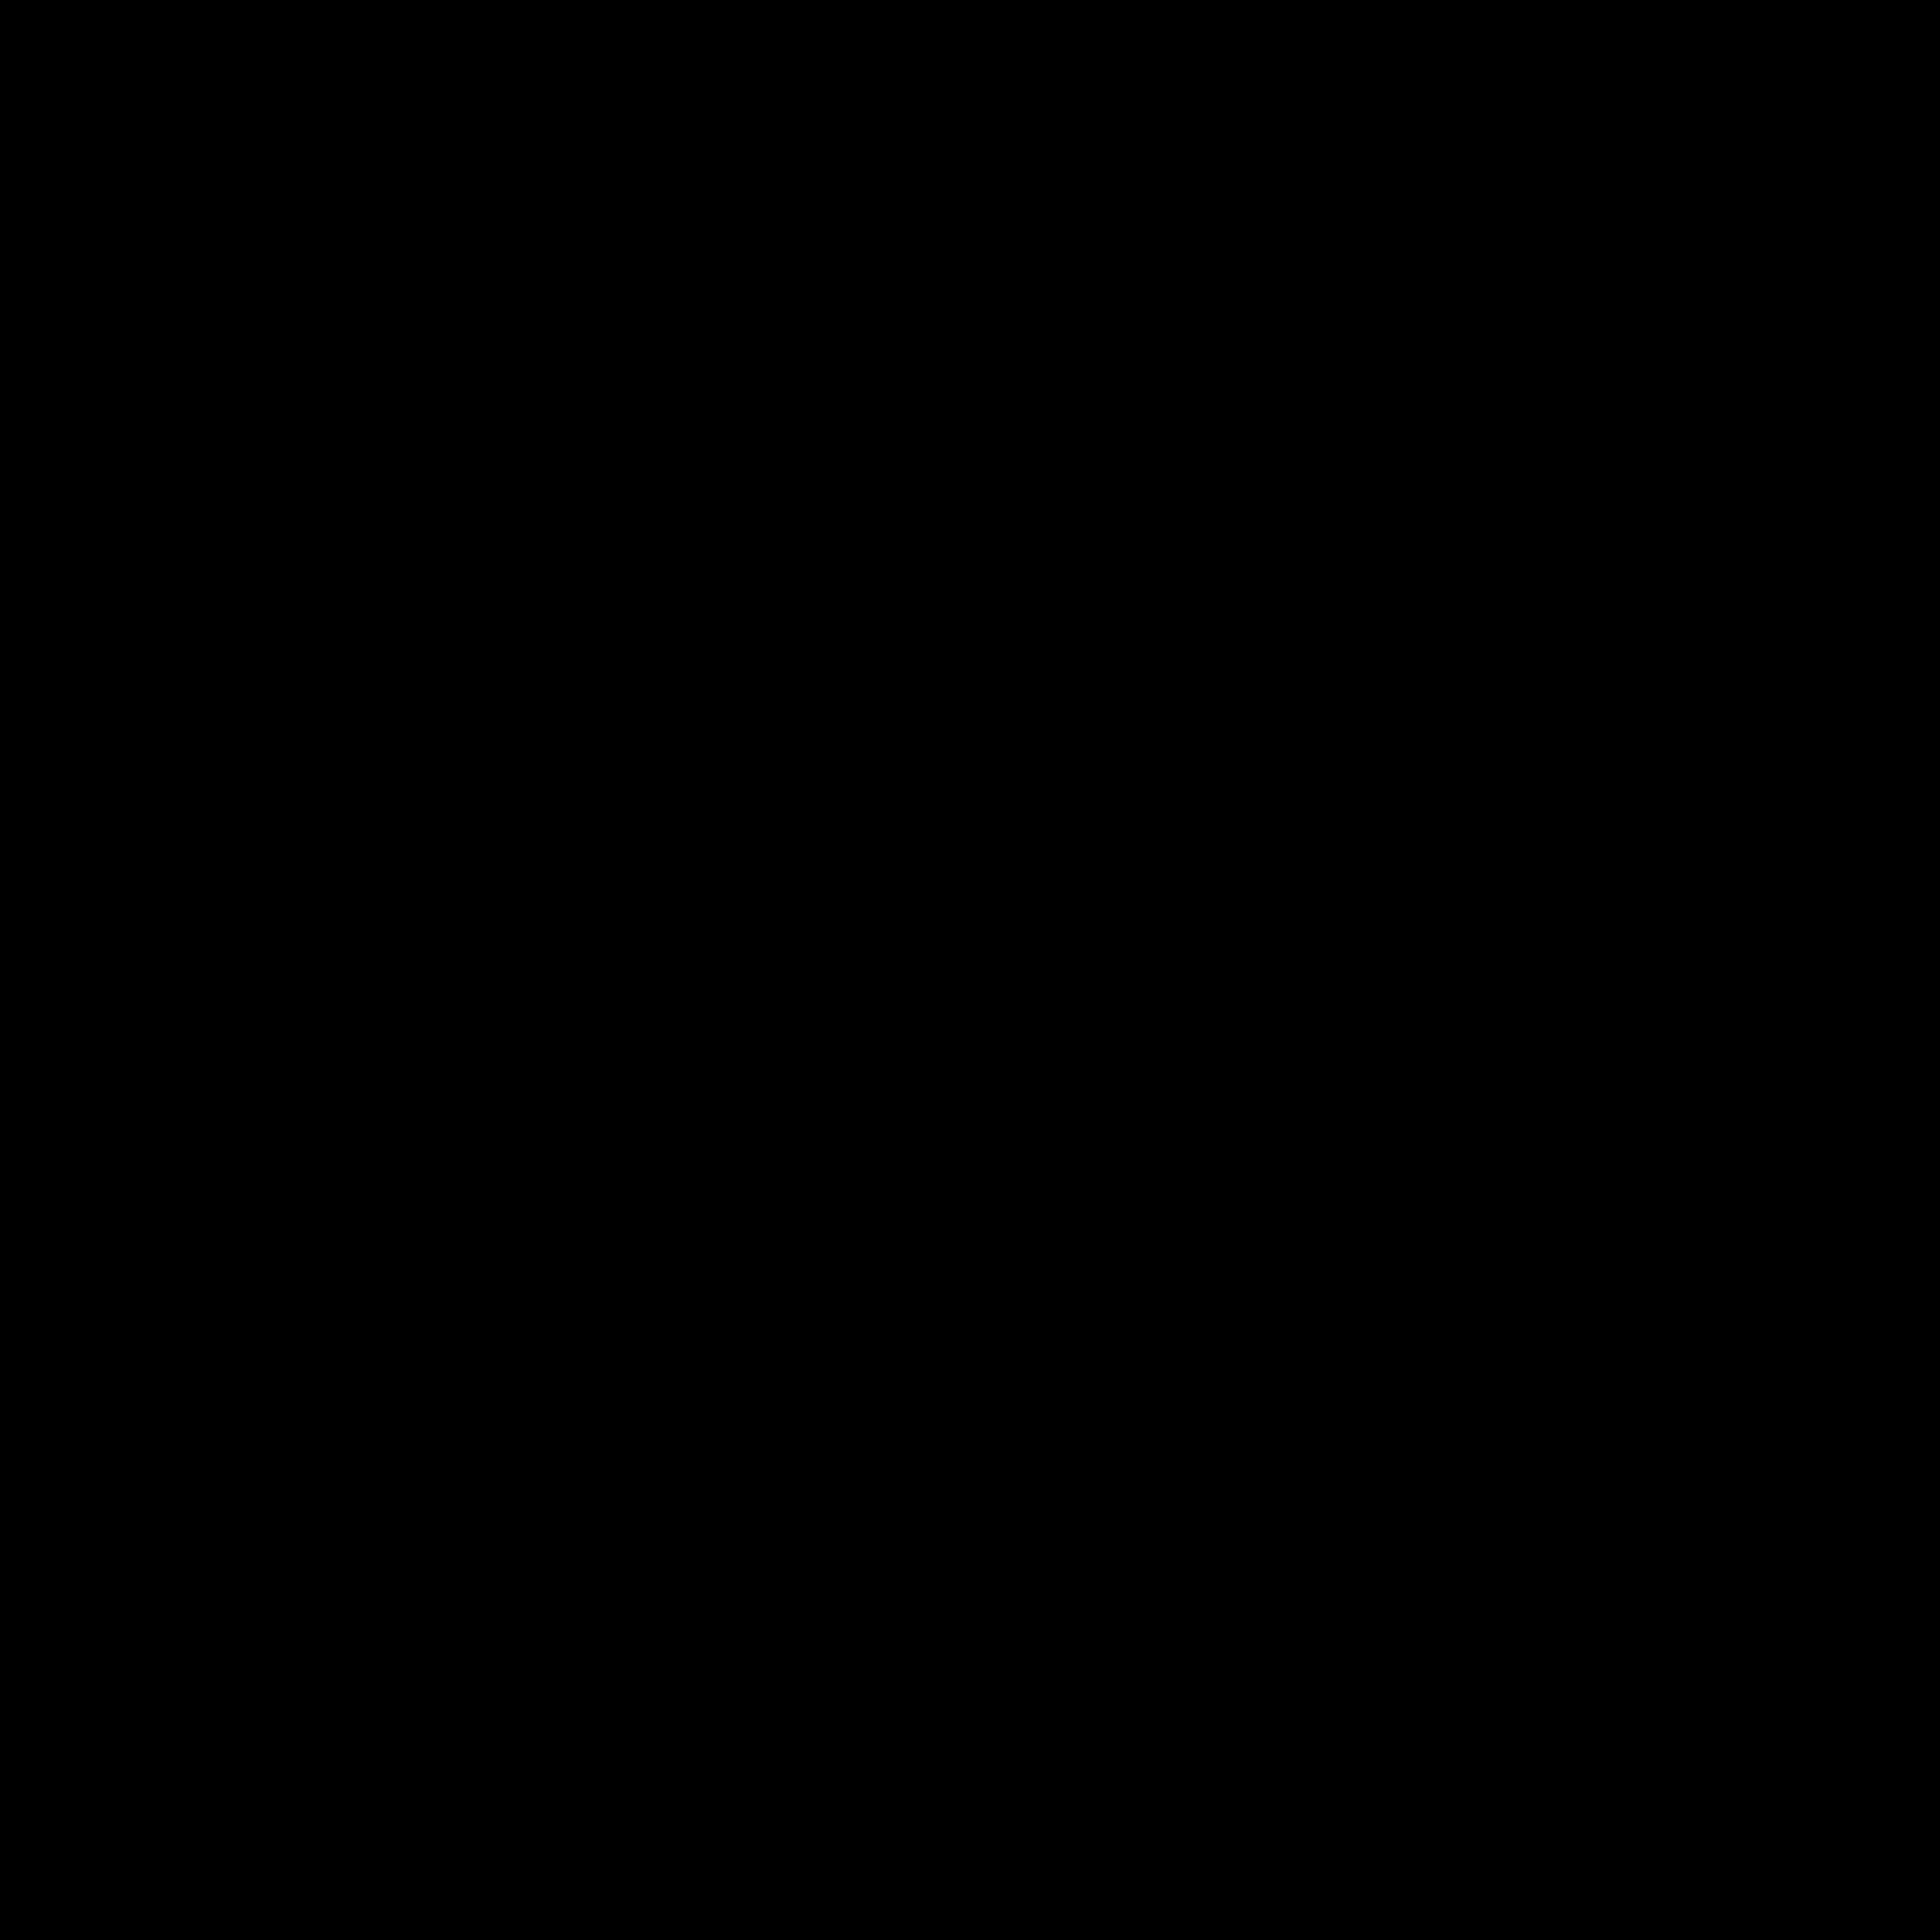 Twitch Logo PNG - 179569